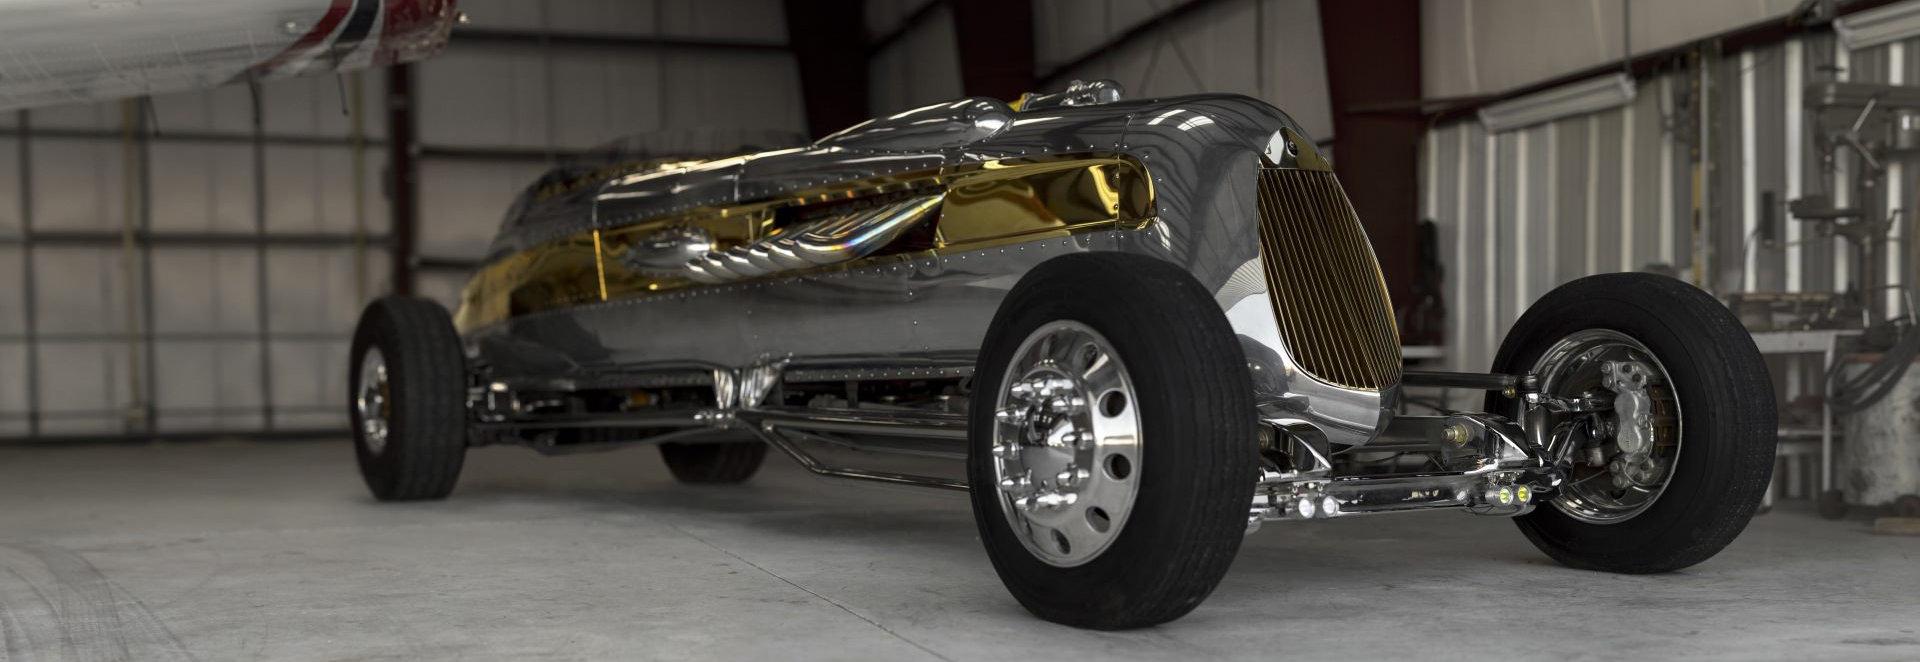 Coche del día: Packard Royal V12 Streamliner Roadster